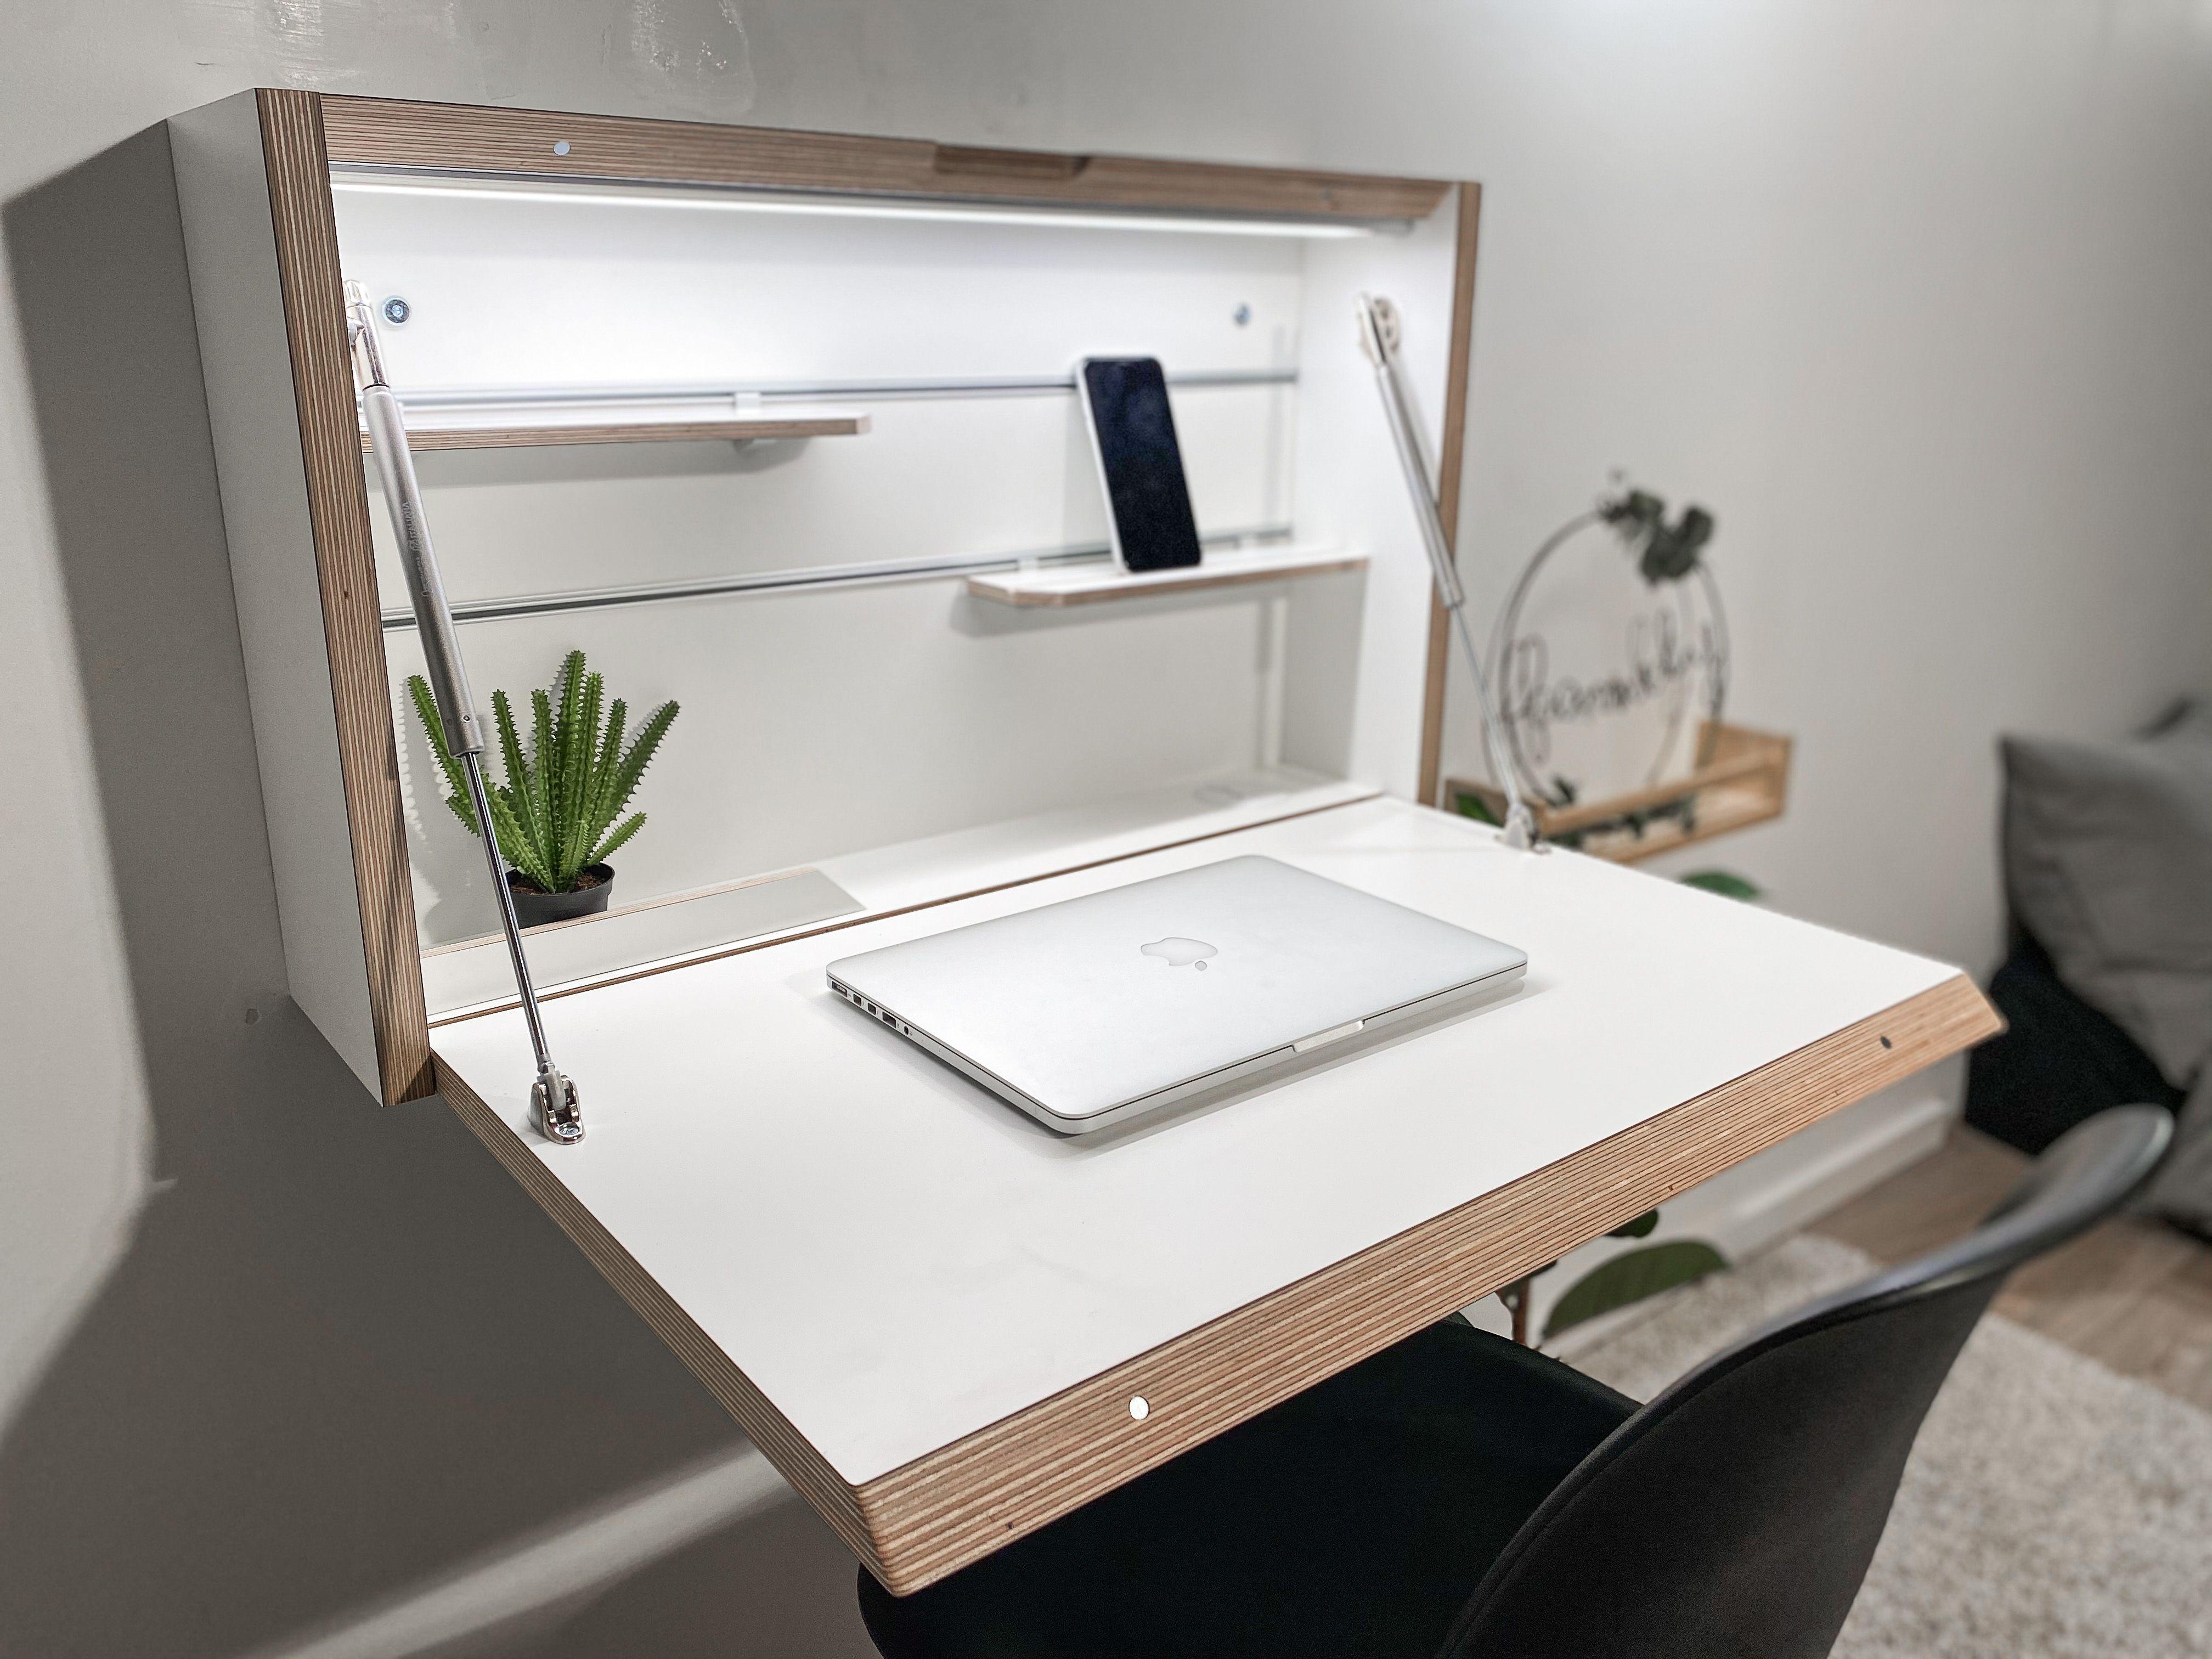 Wall Mounted Folding Desk Space Saving Desk Office Desk Etsy